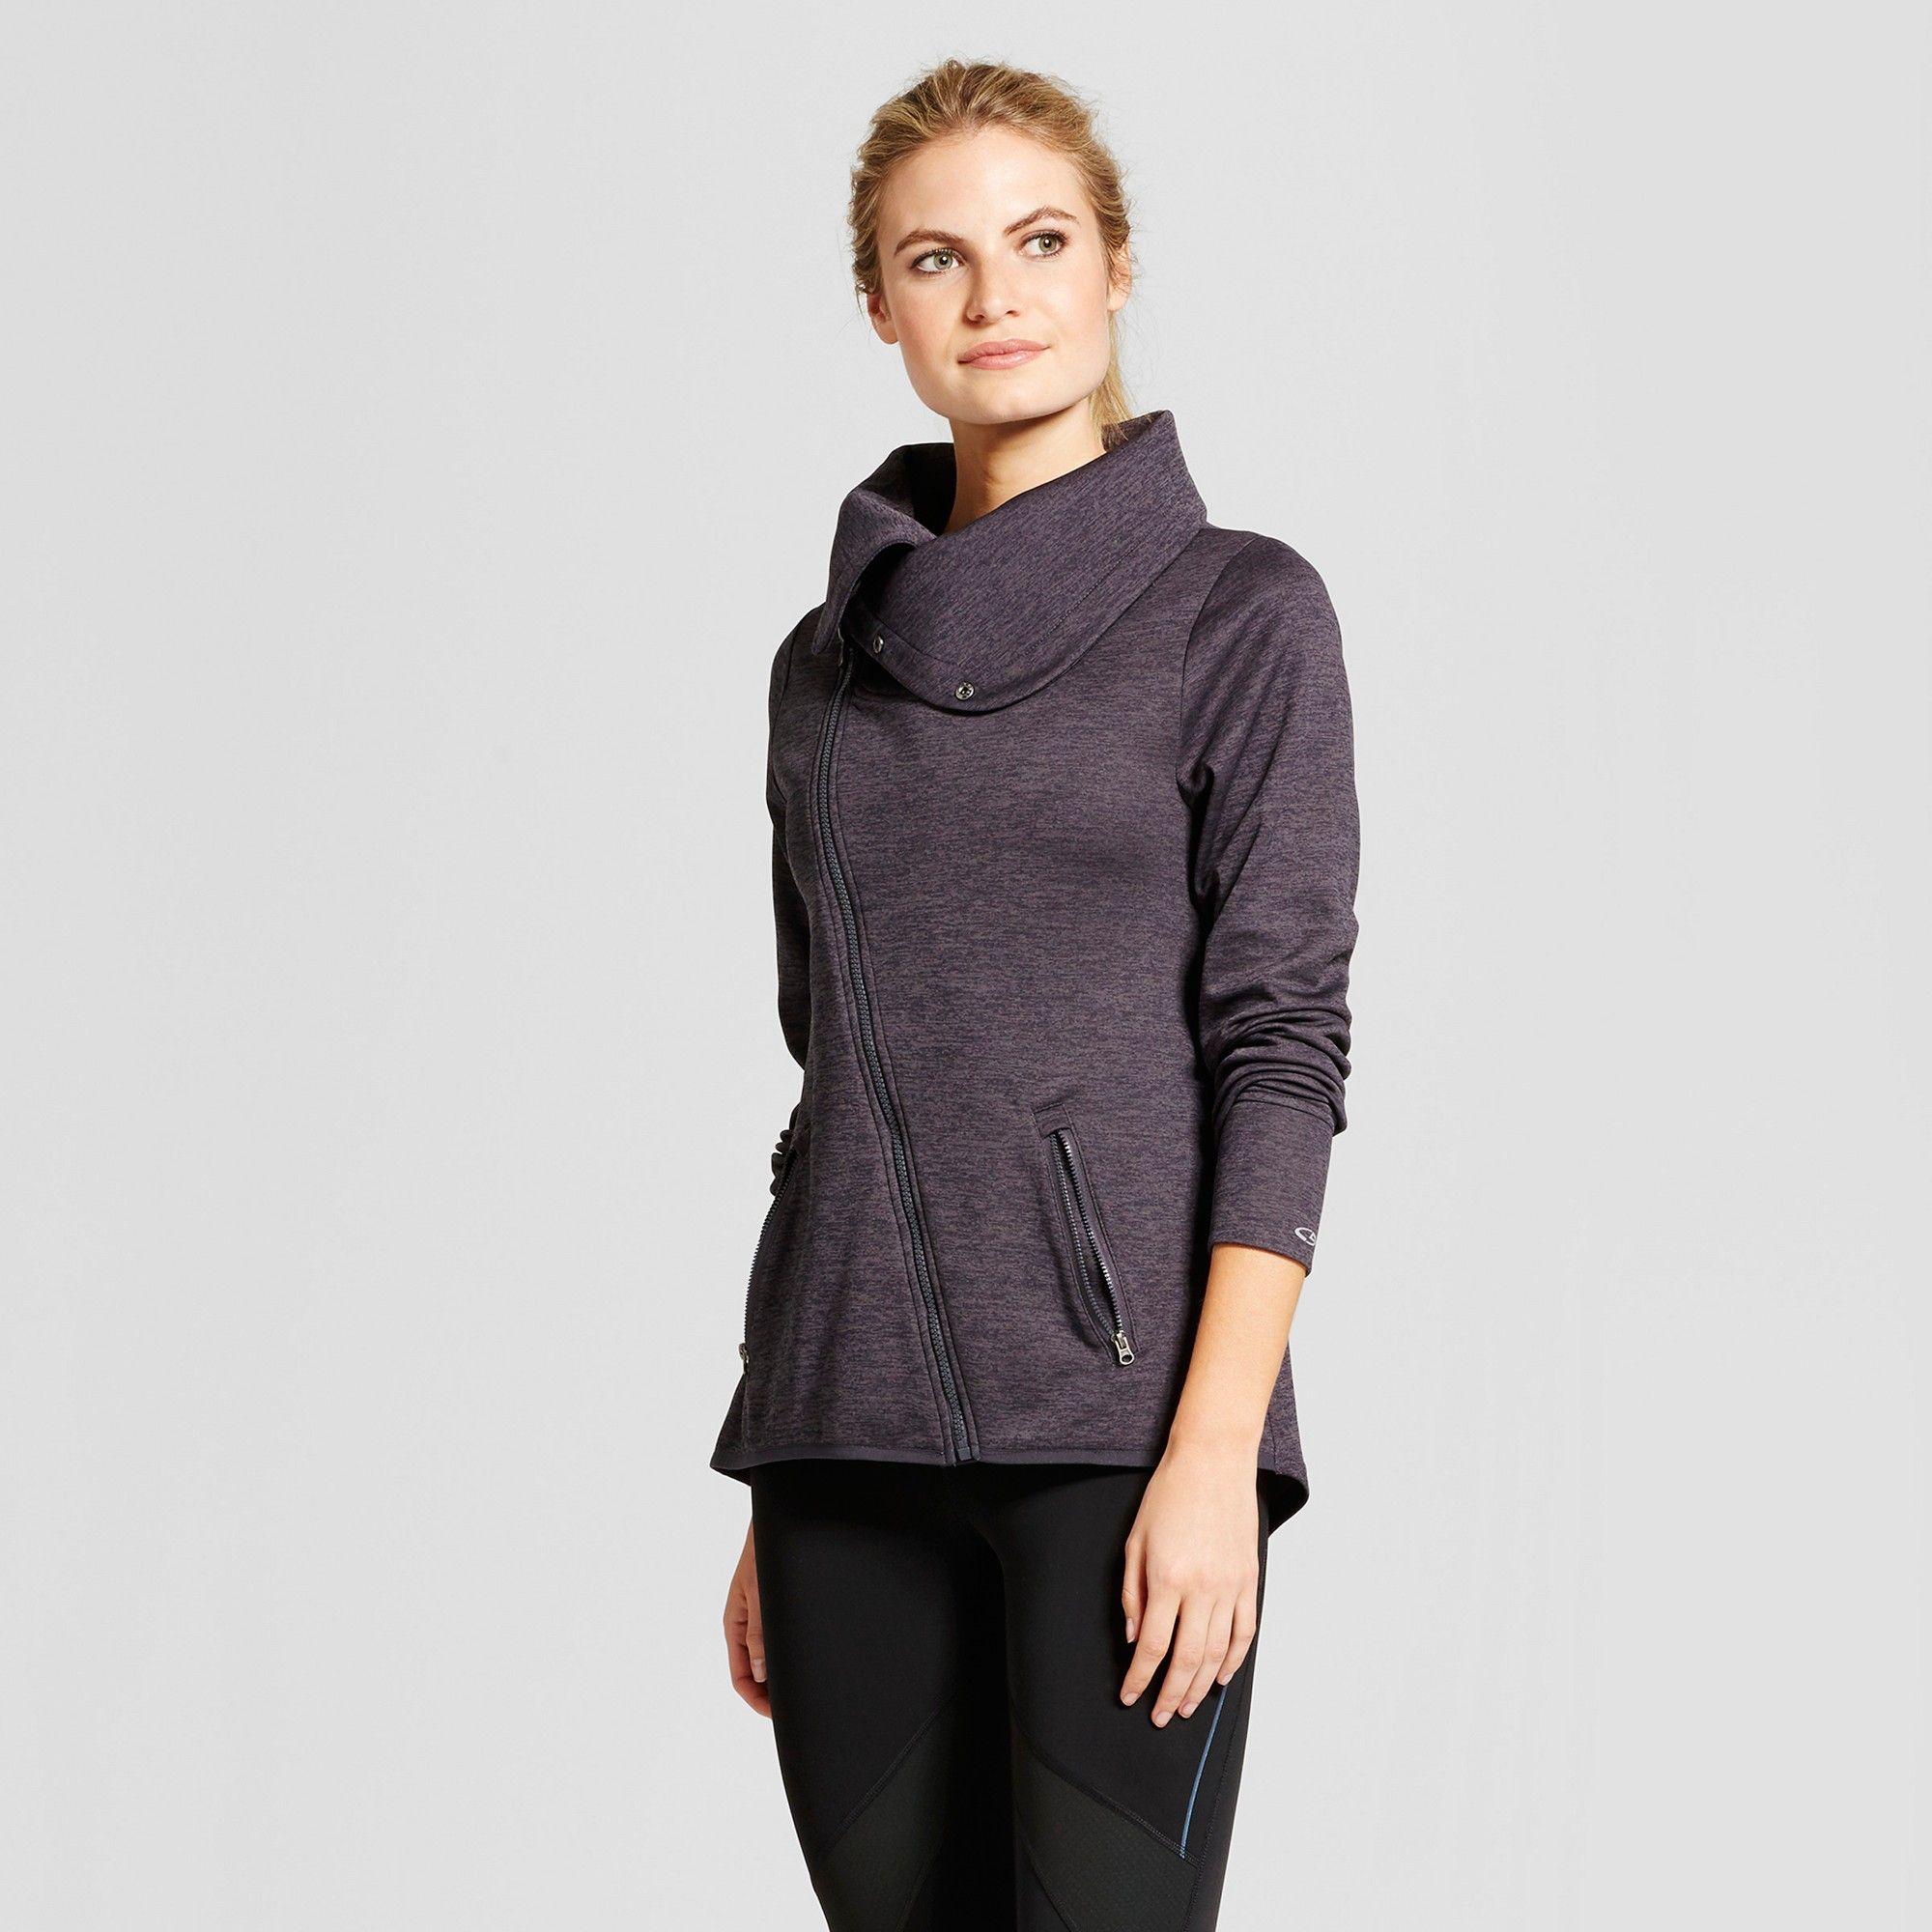 Women's Tech Fleece Asymmetrical Jacket C9 Champion Dark